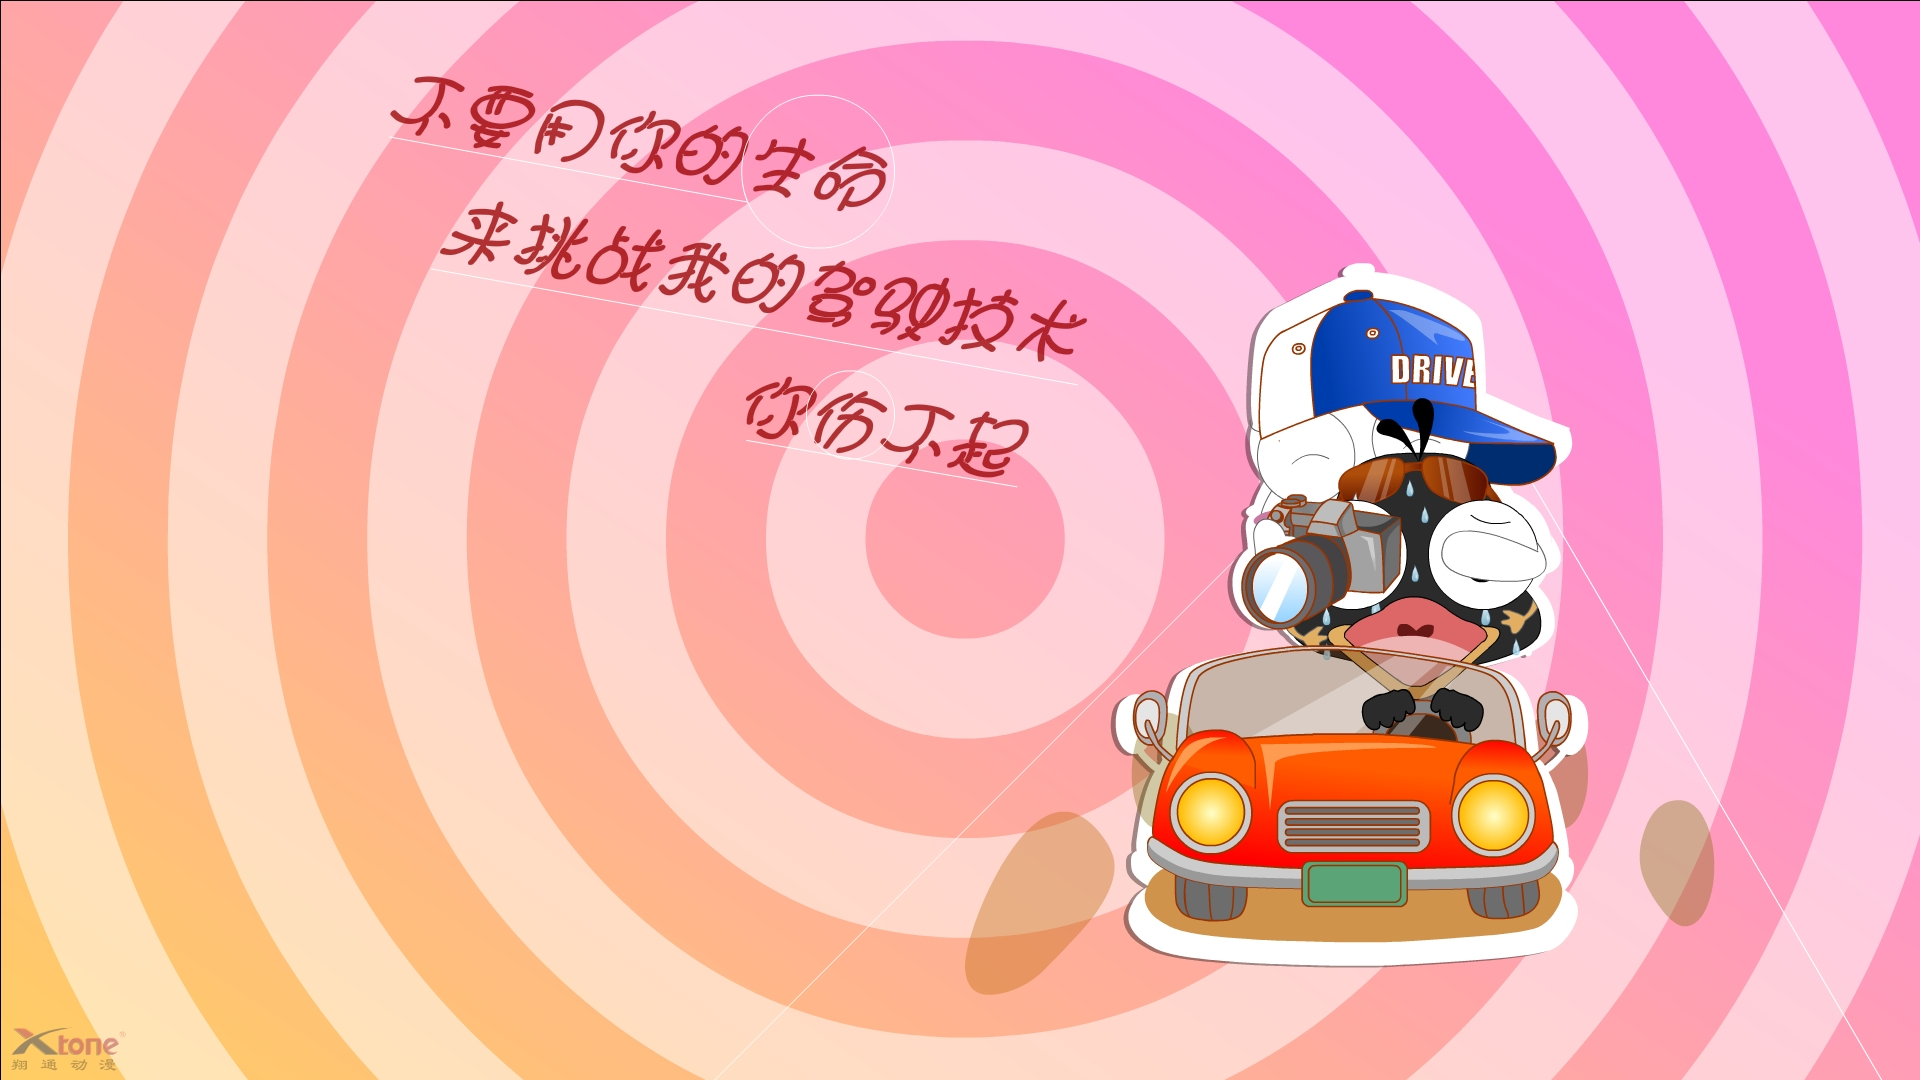 xtone翔通动漫集团-嘟嘟鹅精美壁纸(一)图片